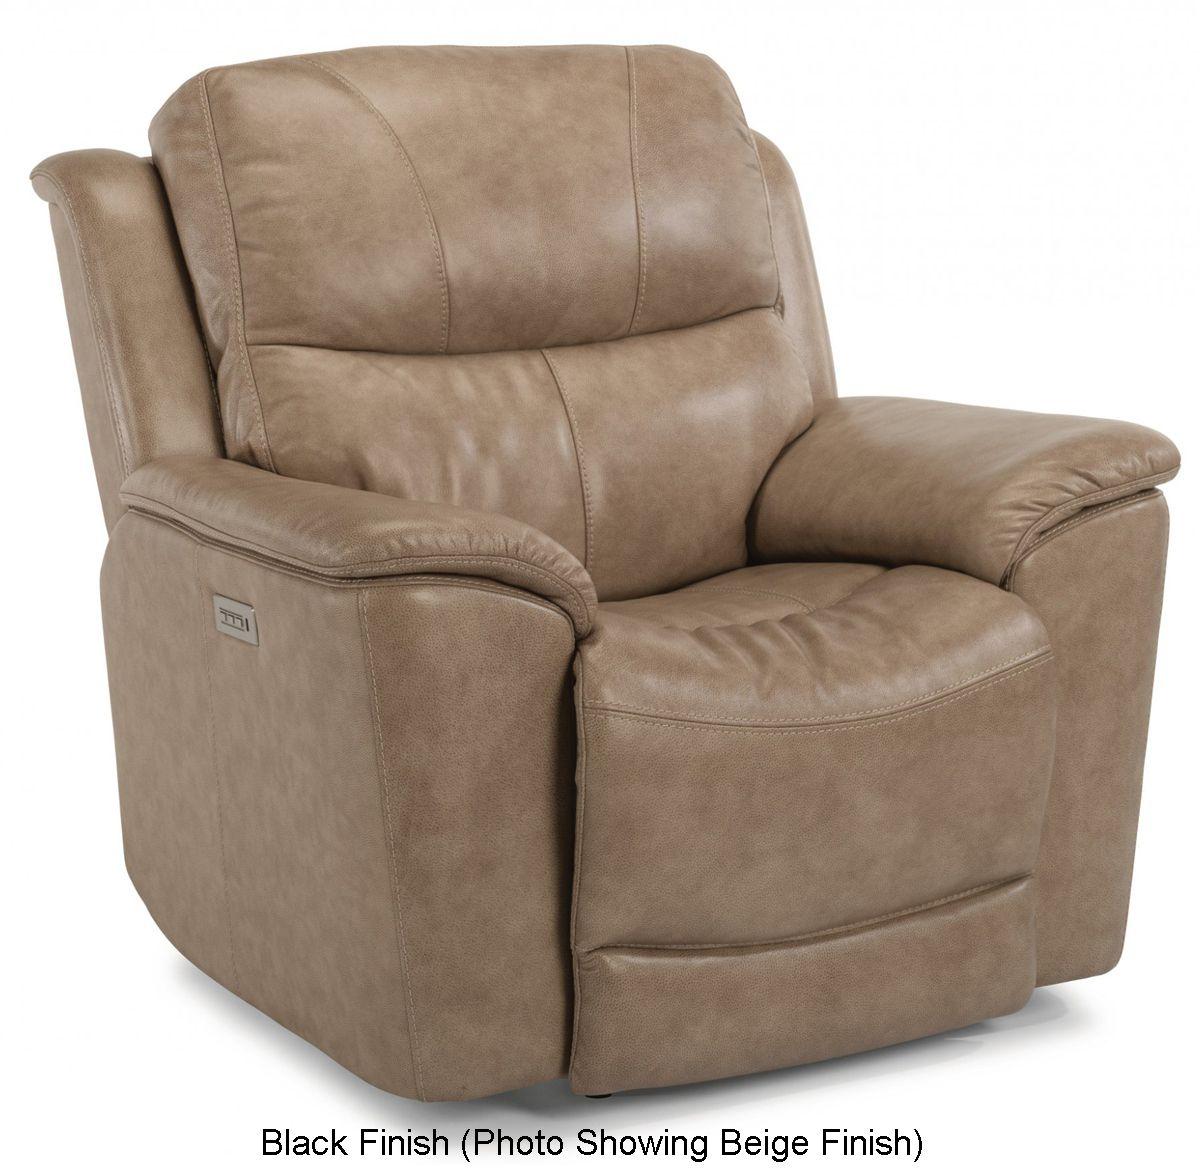 Wondrous Flexsteel Black Cade Leather Power Recliner With Power Headrest Machost Co Dining Chair Design Ideas Machostcouk